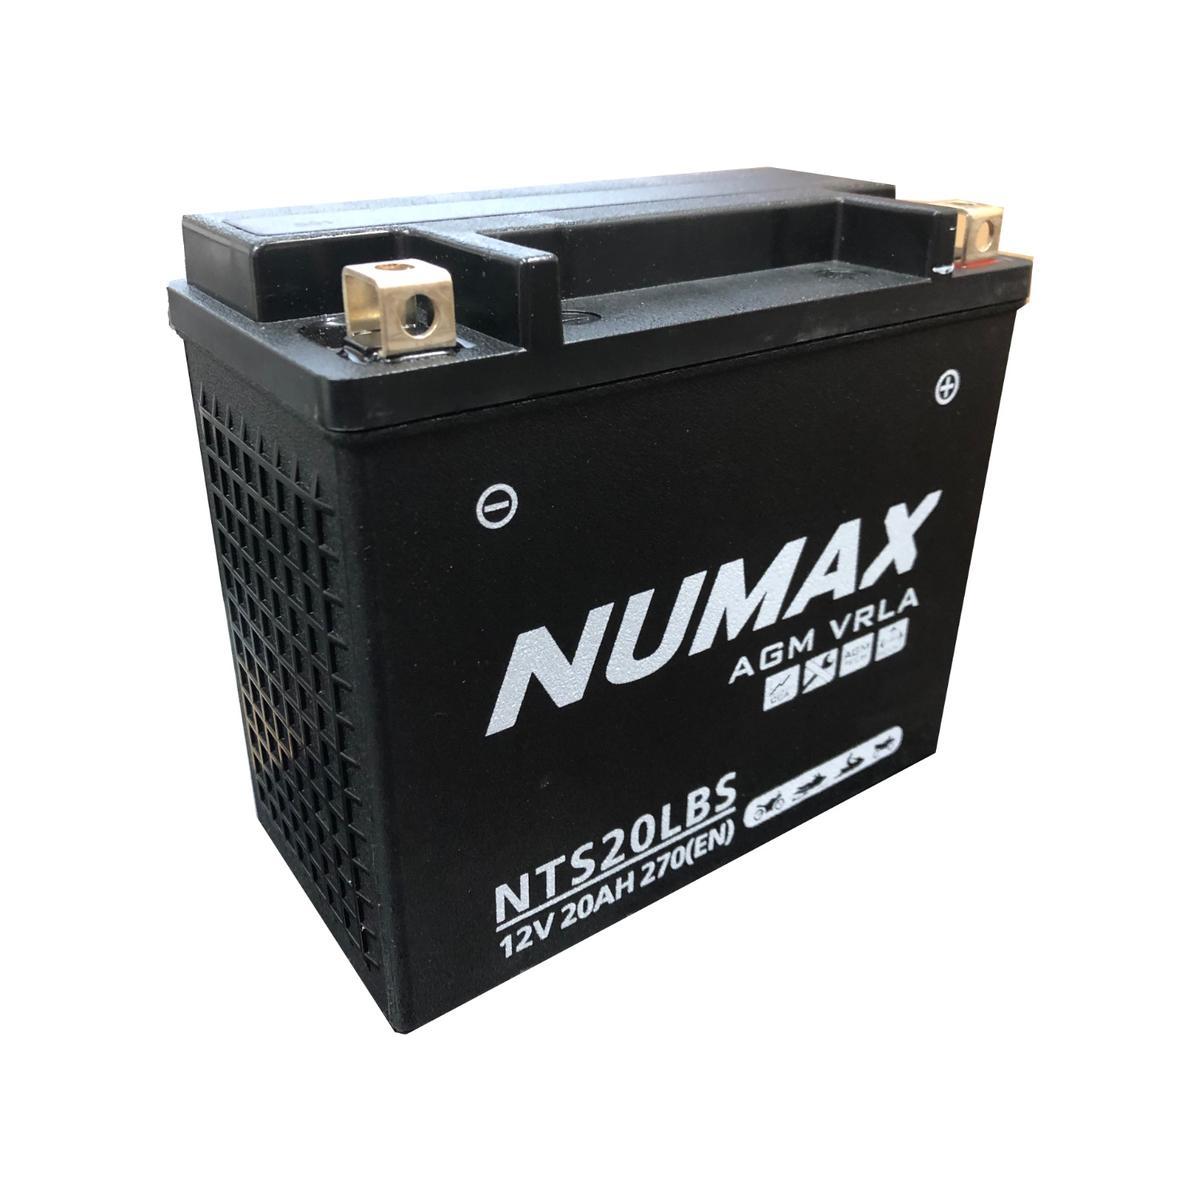 Numax NTS20LBS 12v Motorbike Motorcycle Bike Battery Replaces YTX20L-BS YTX20L-4